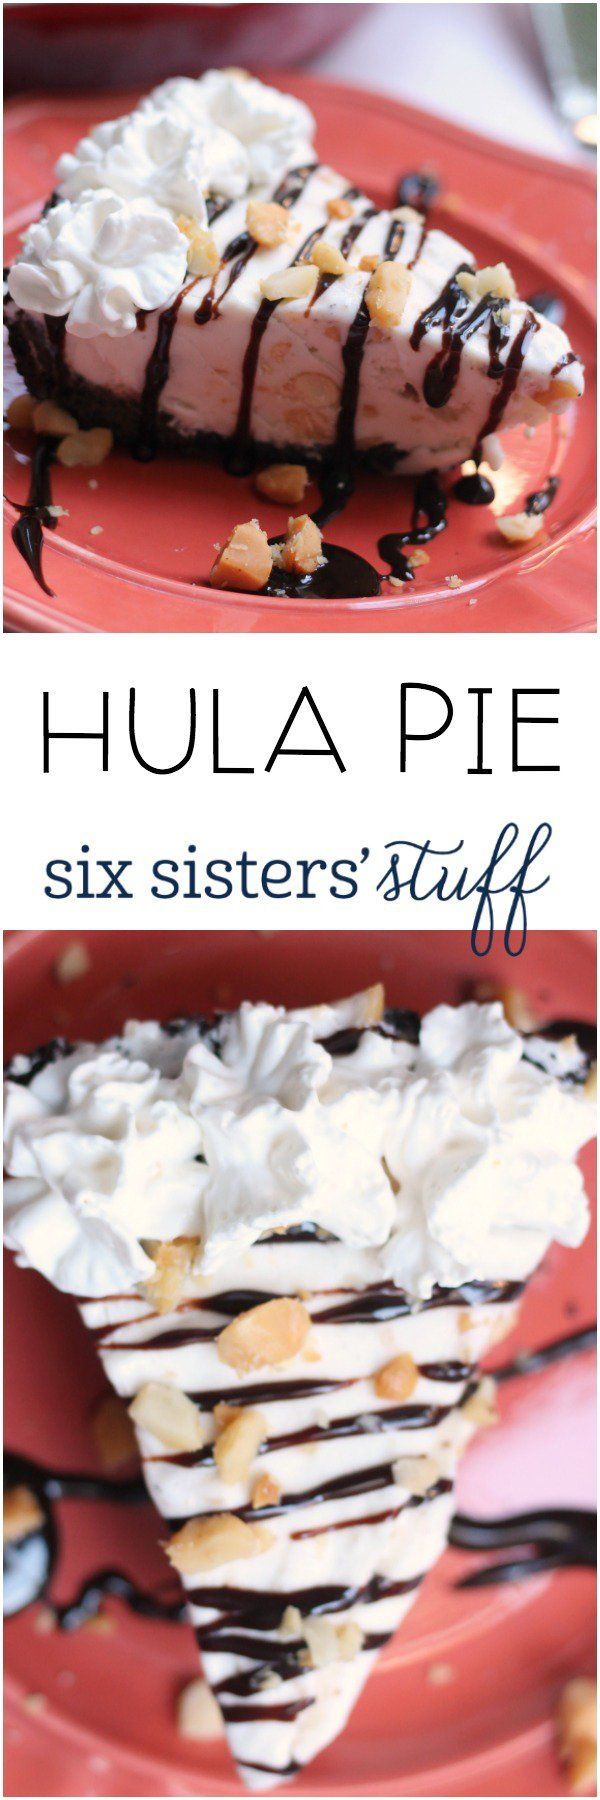 Hula Pie on Six Sisters' Stuff